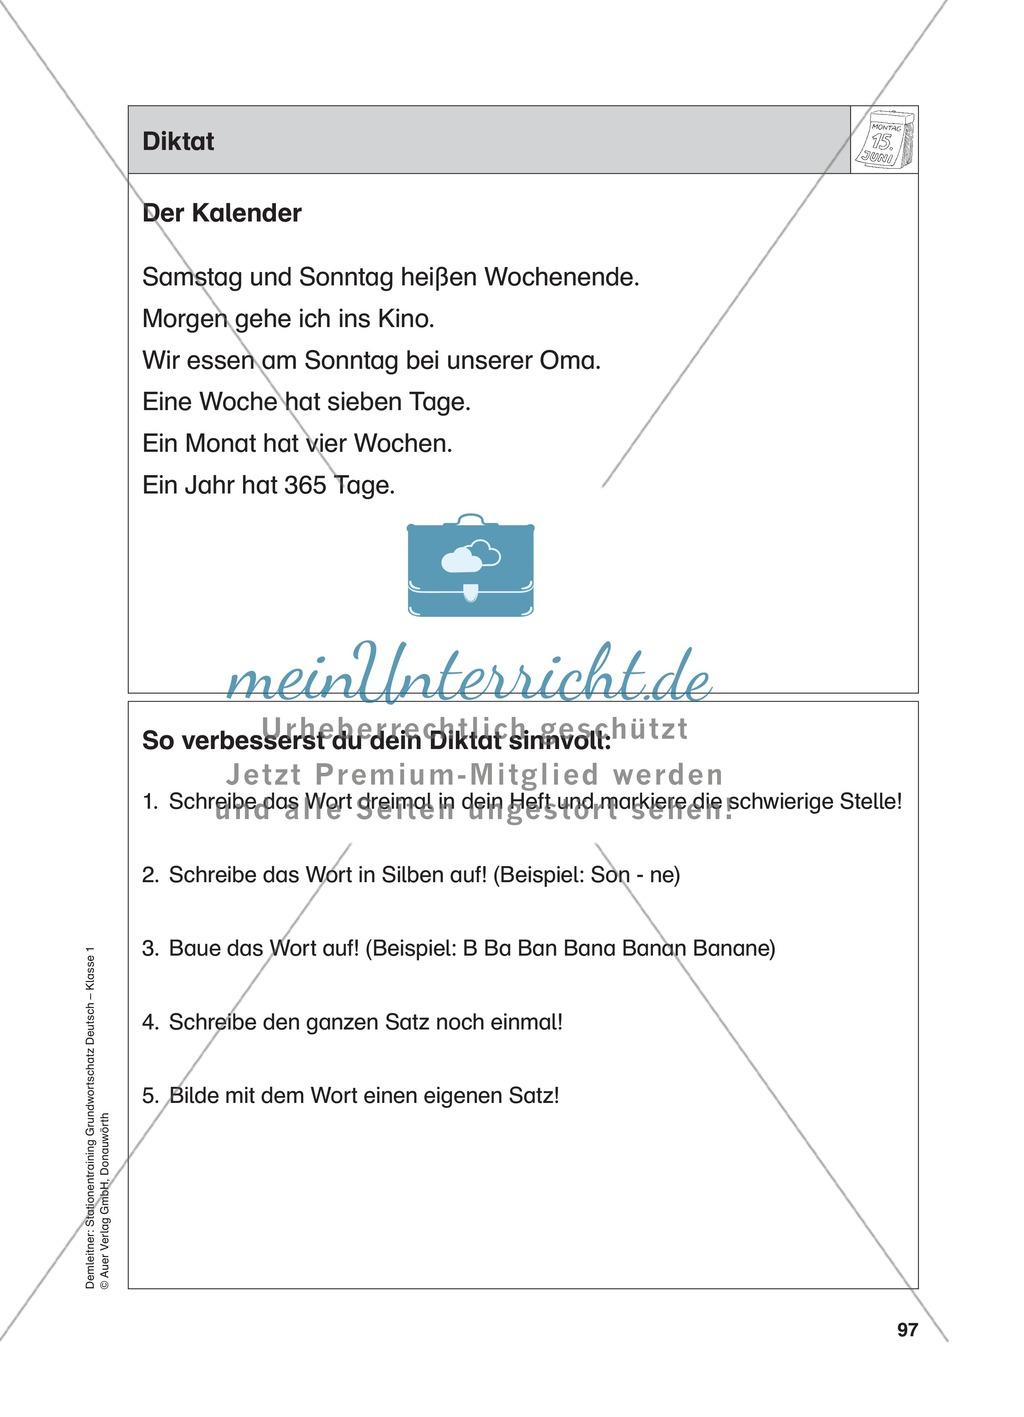 Stationentraining Kalender: Arbeitsblätter mit Lösungen, Diktat Preview 14